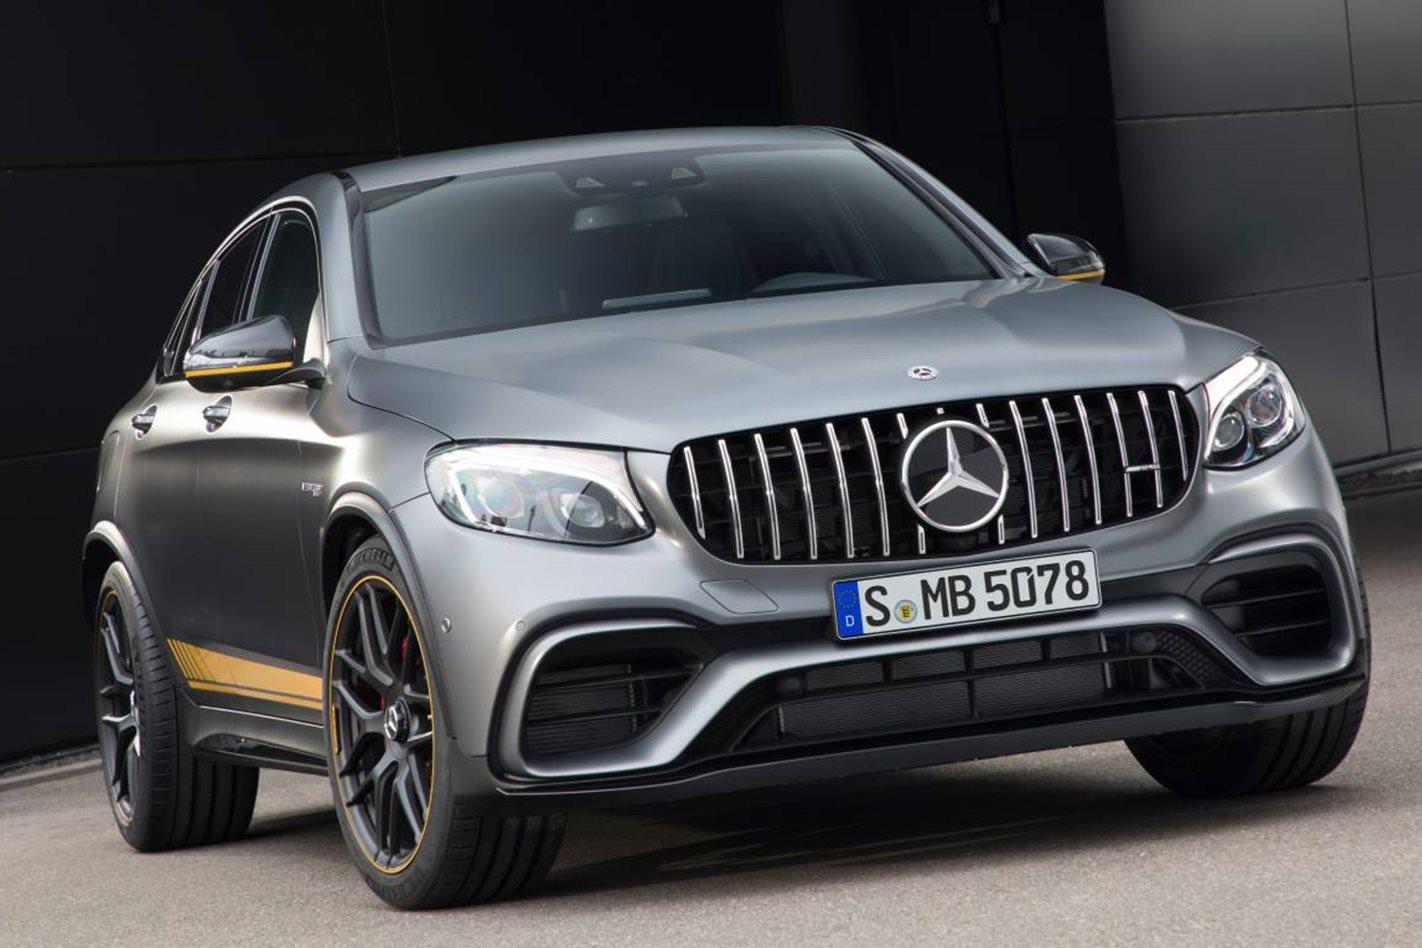 Mercedes-AMG GLC63 S front